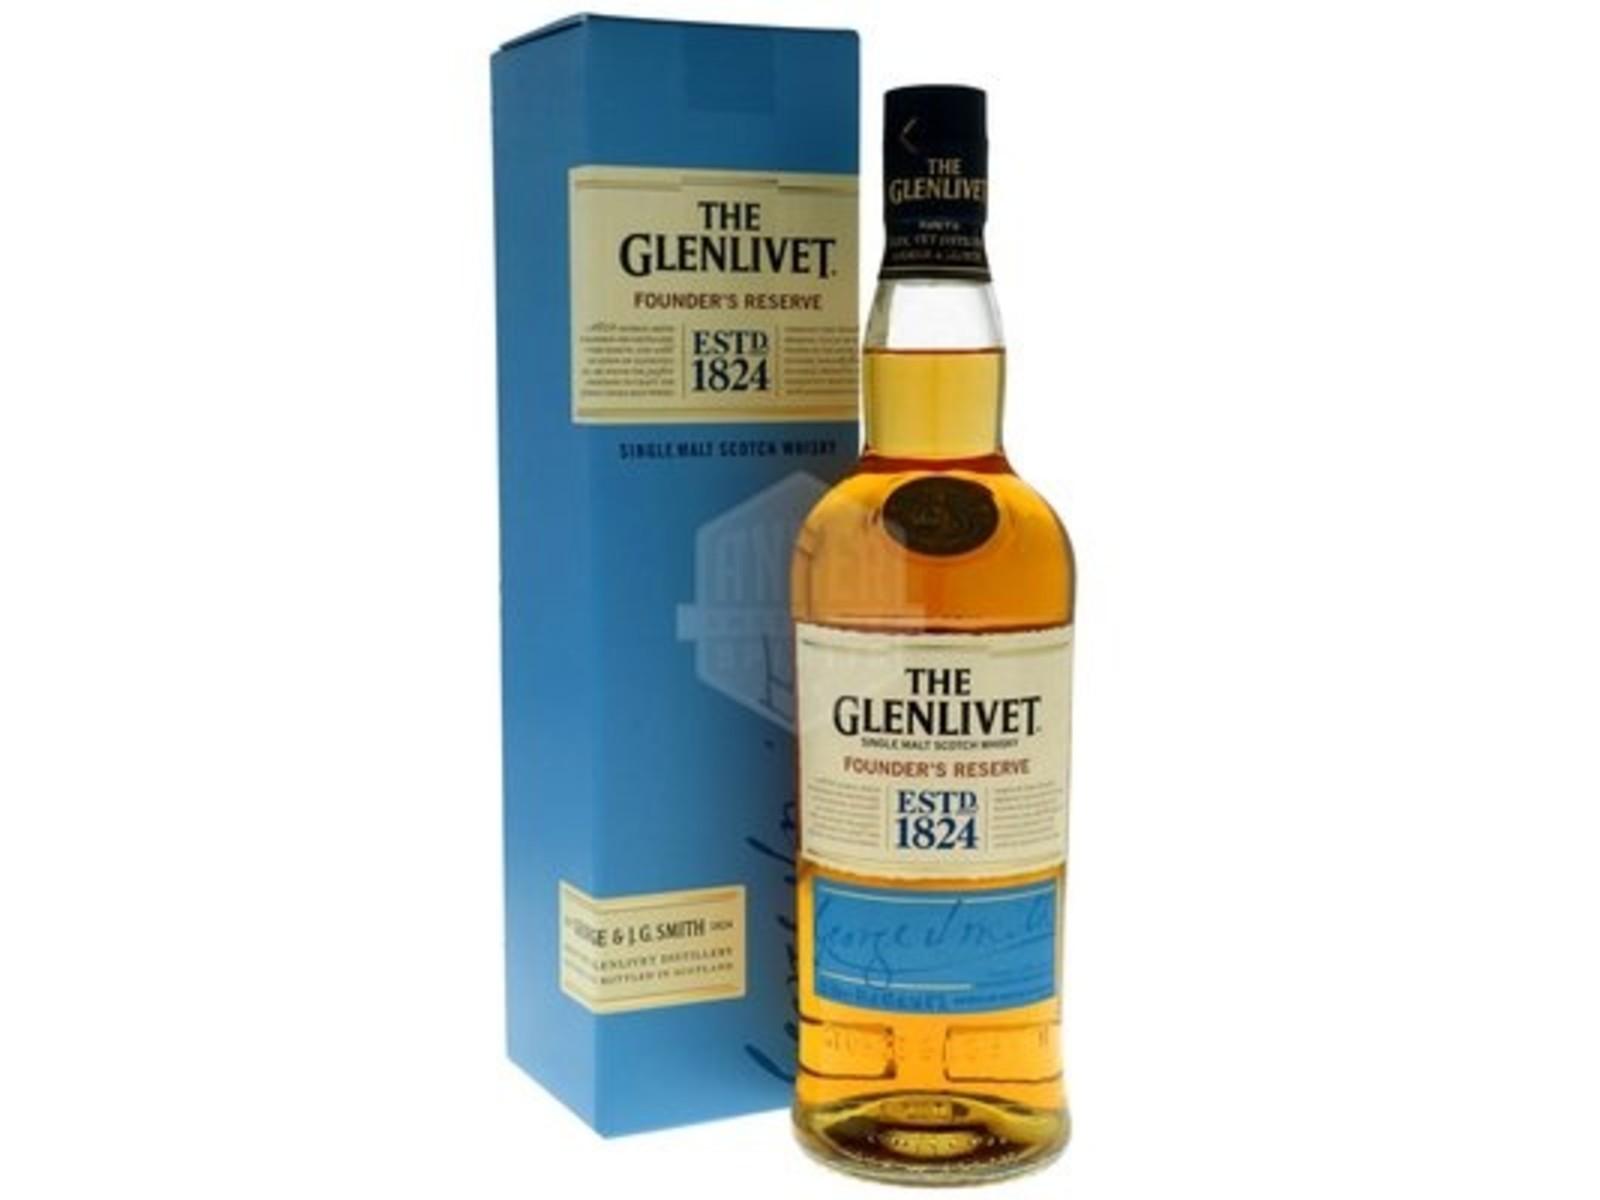 The Glenlivet The Glenlivet / Founder's Reserve / Whiskey / 0,7